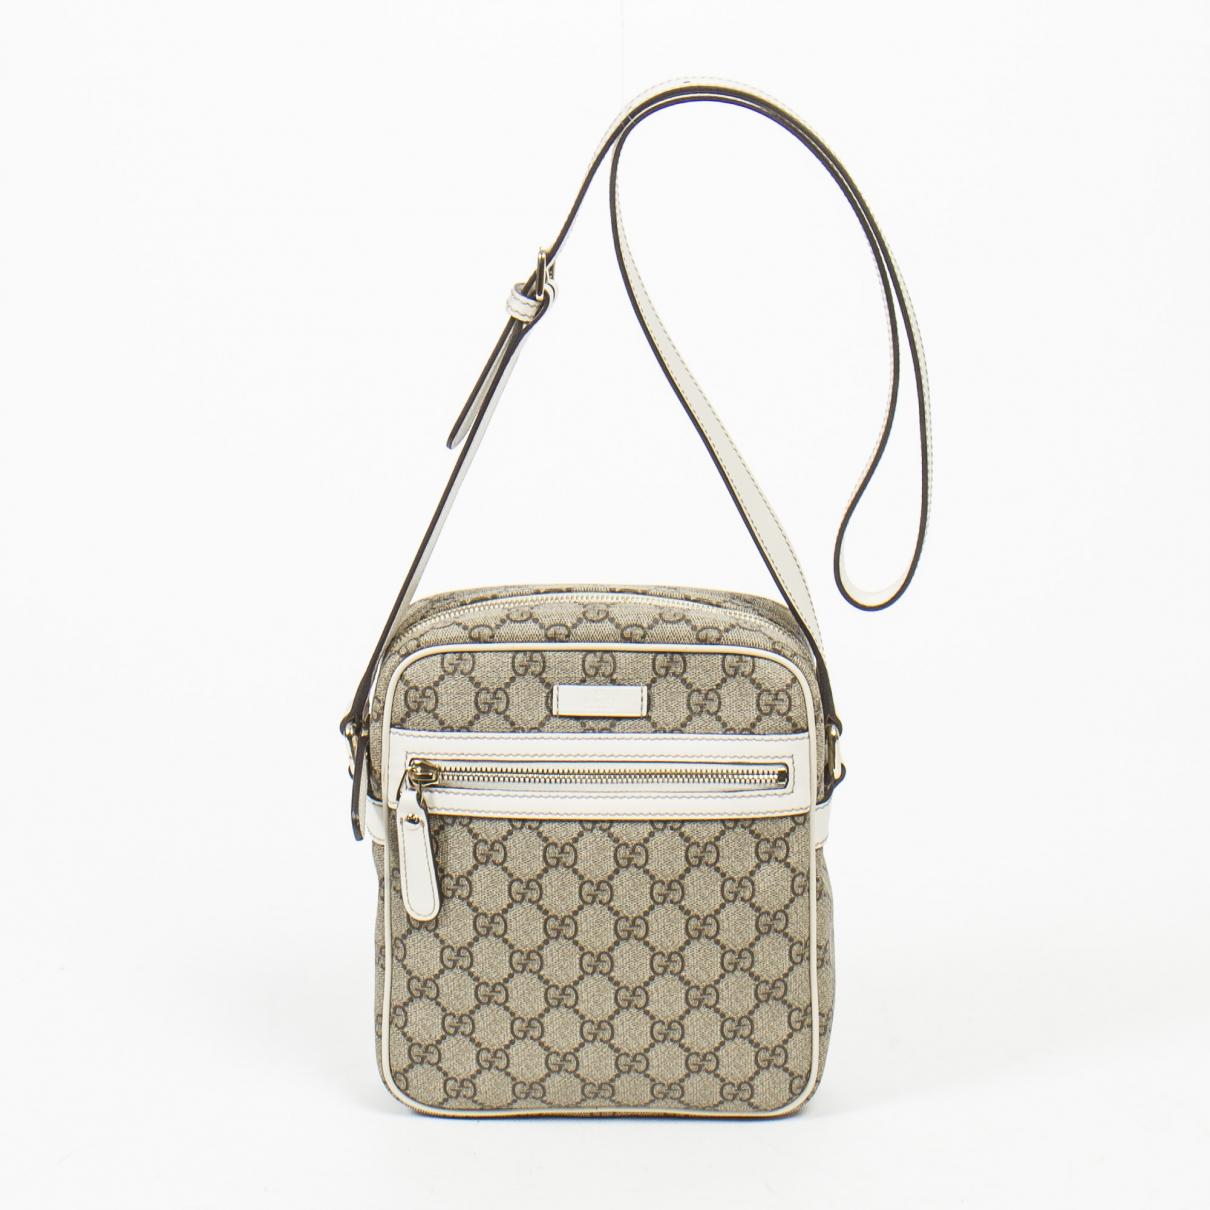 Gucci \N Beige Cotton handbag for Women \N